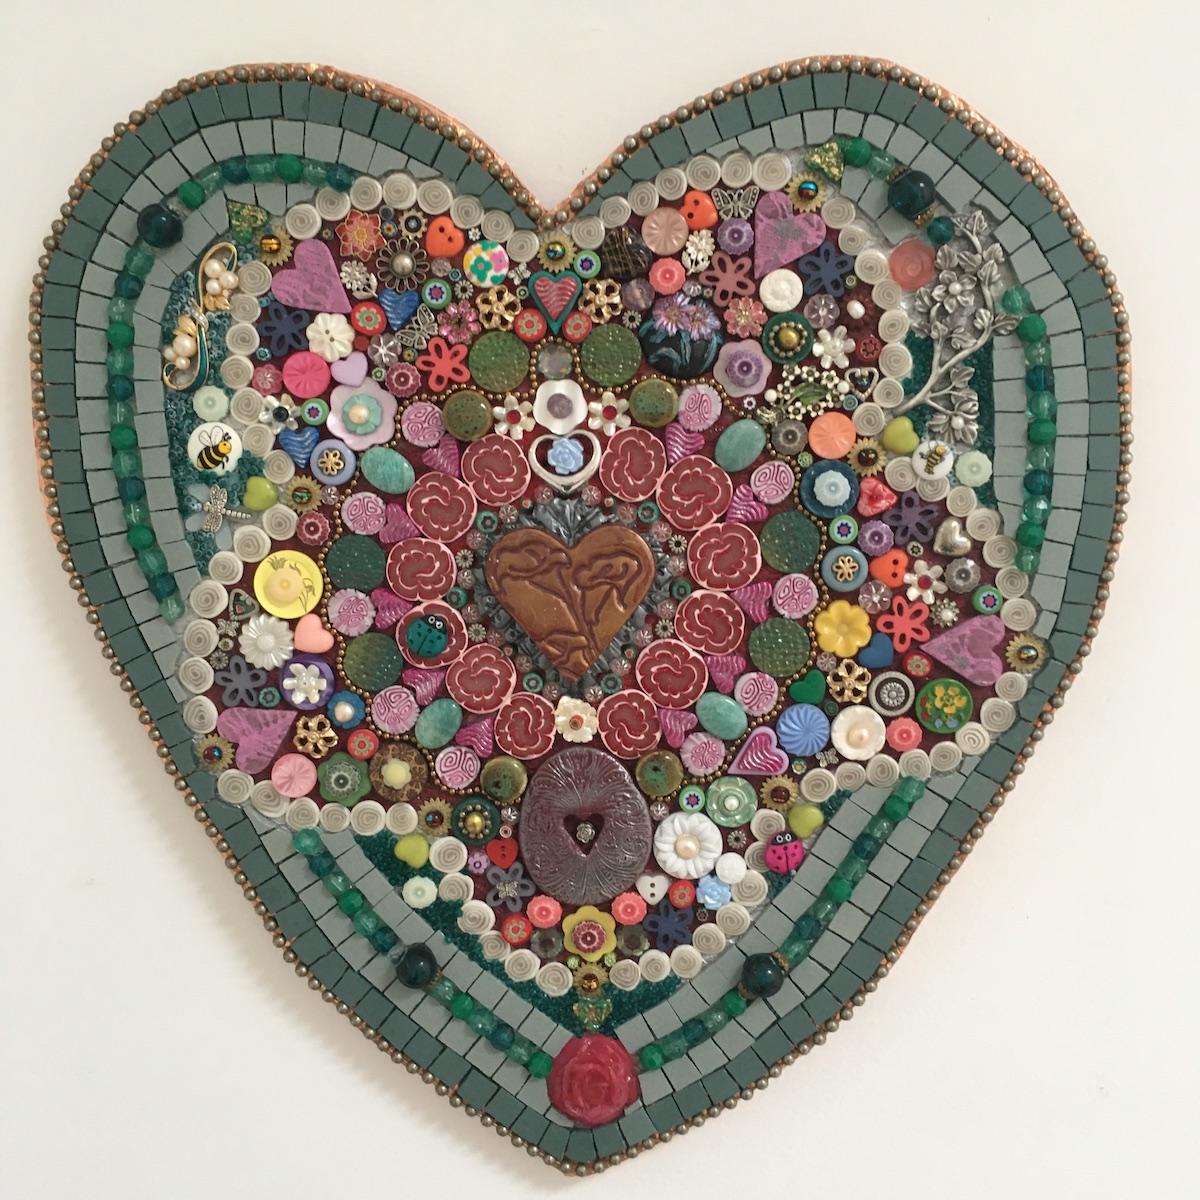 In The Heart Of The Garden By Amethyst Moon Art